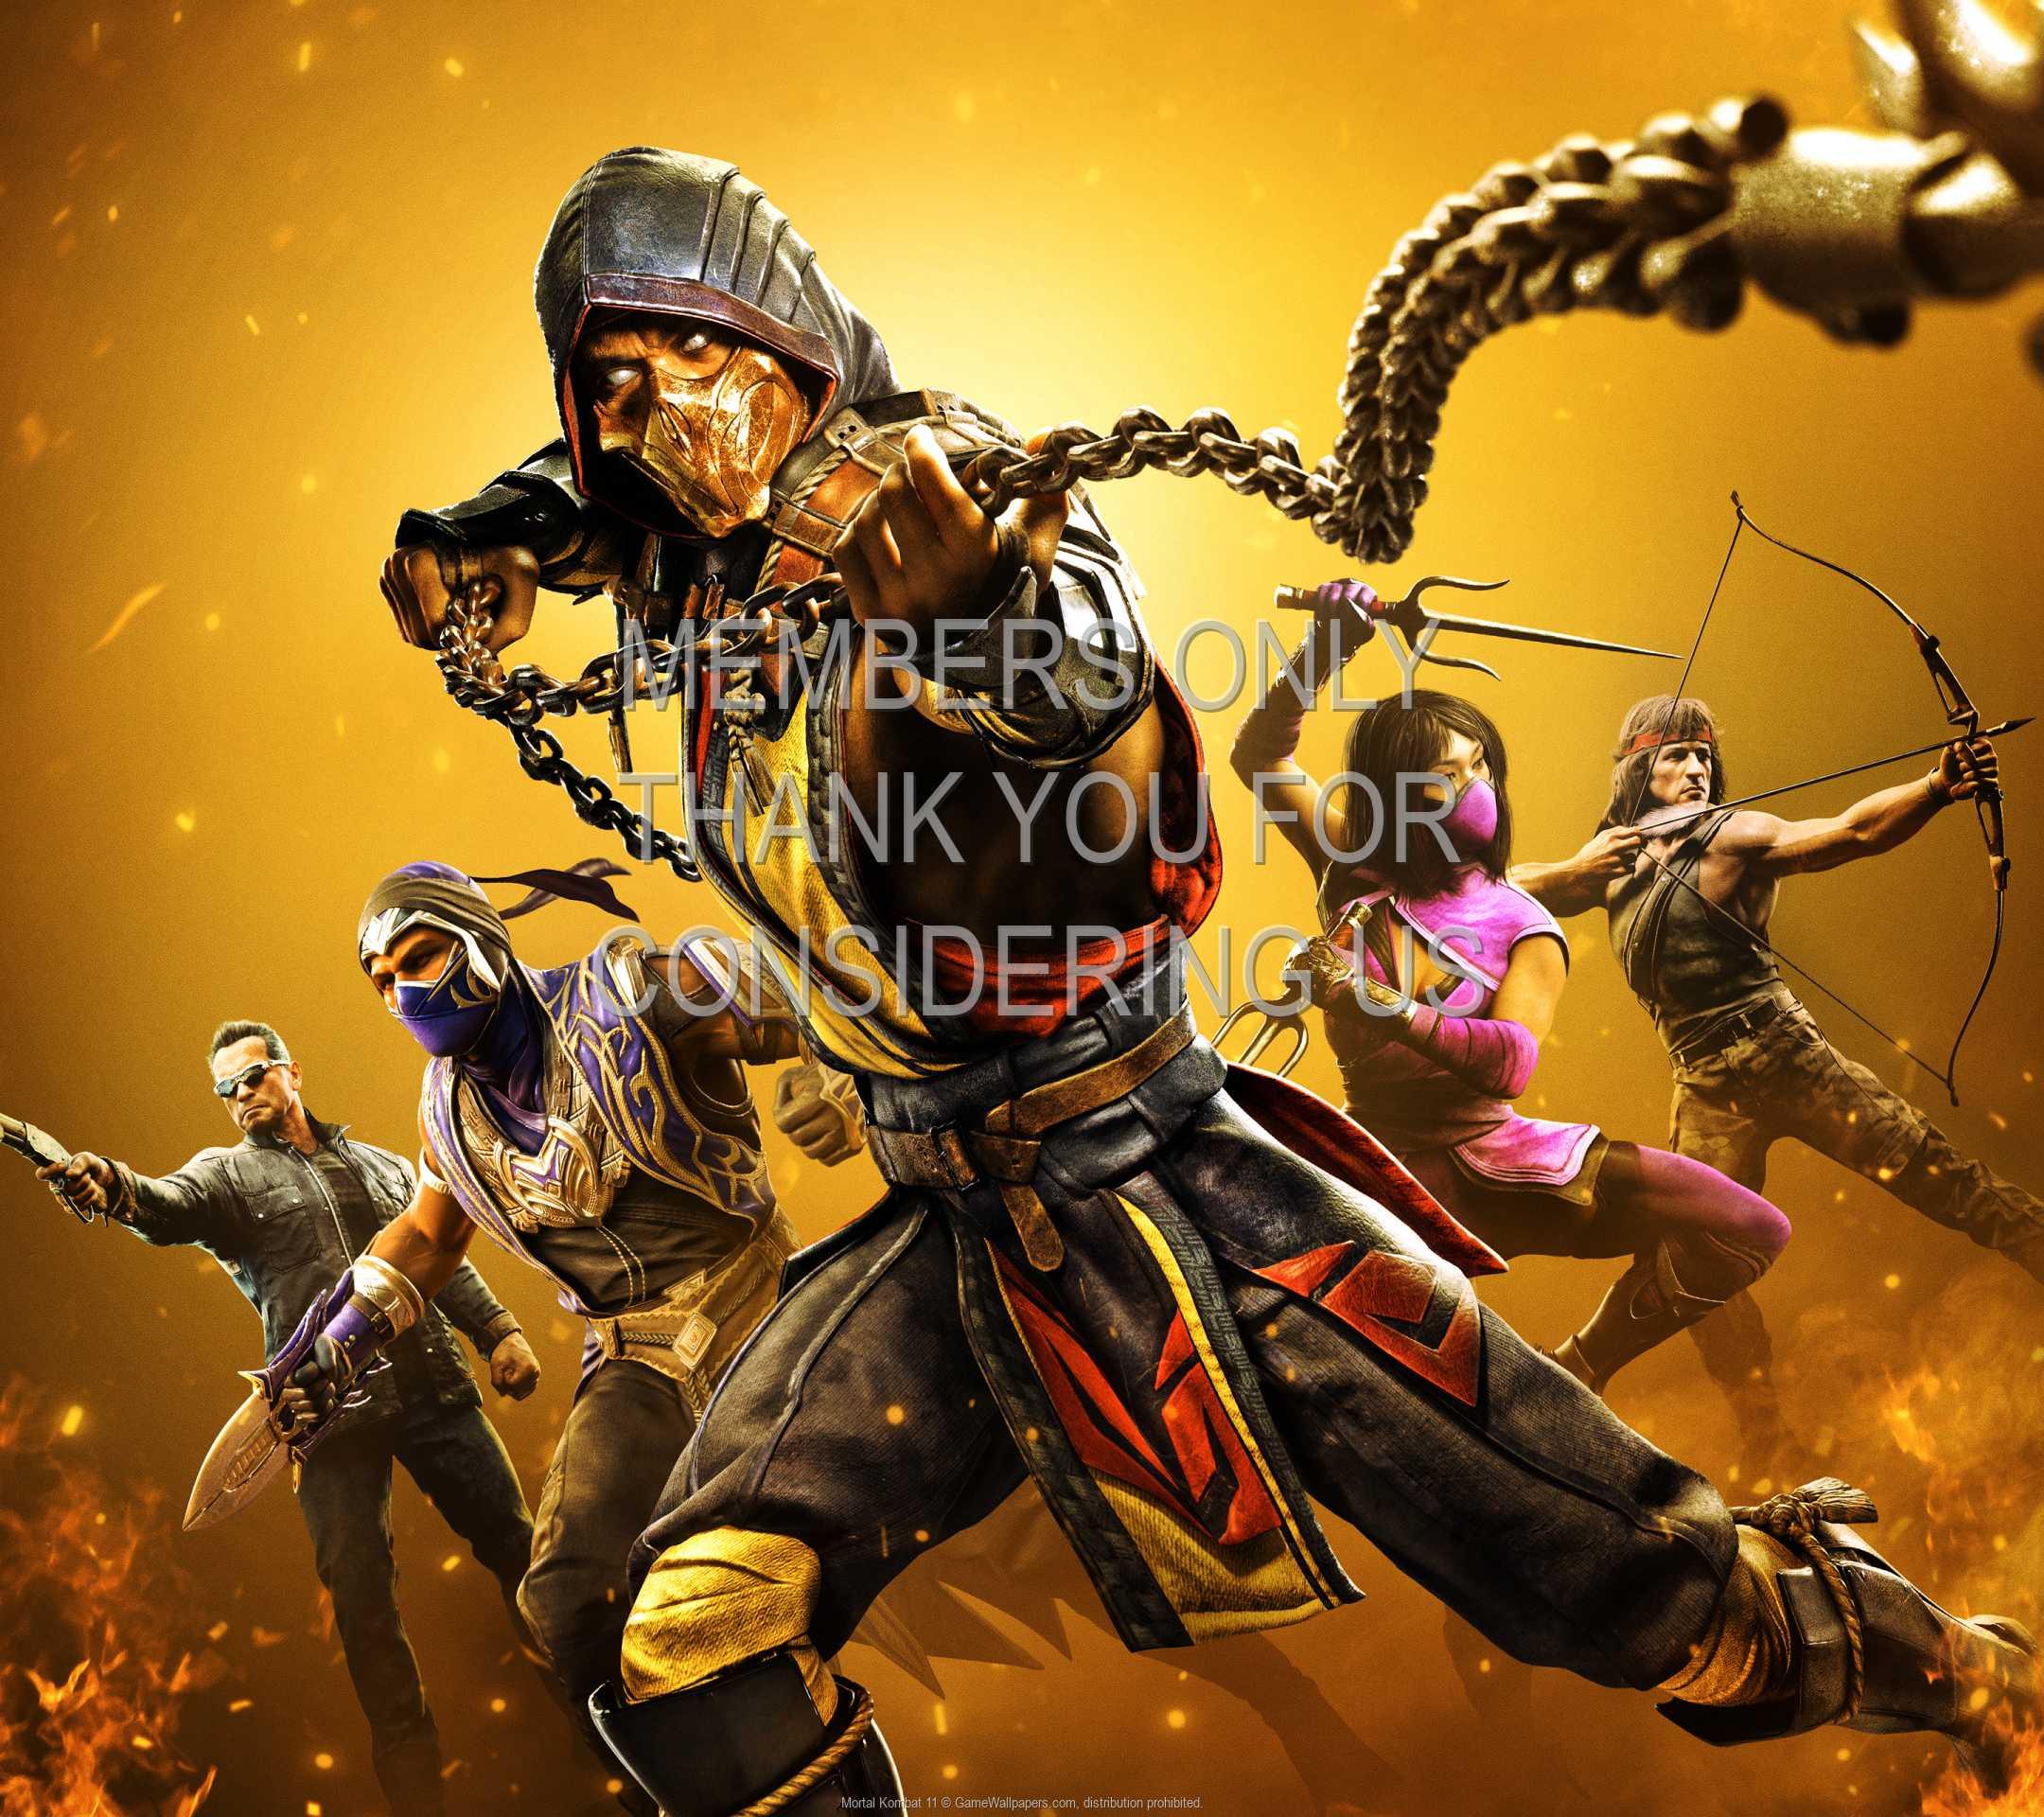 Mortal Kombat 11 1080p Horizontal Mobile wallpaper or background 05